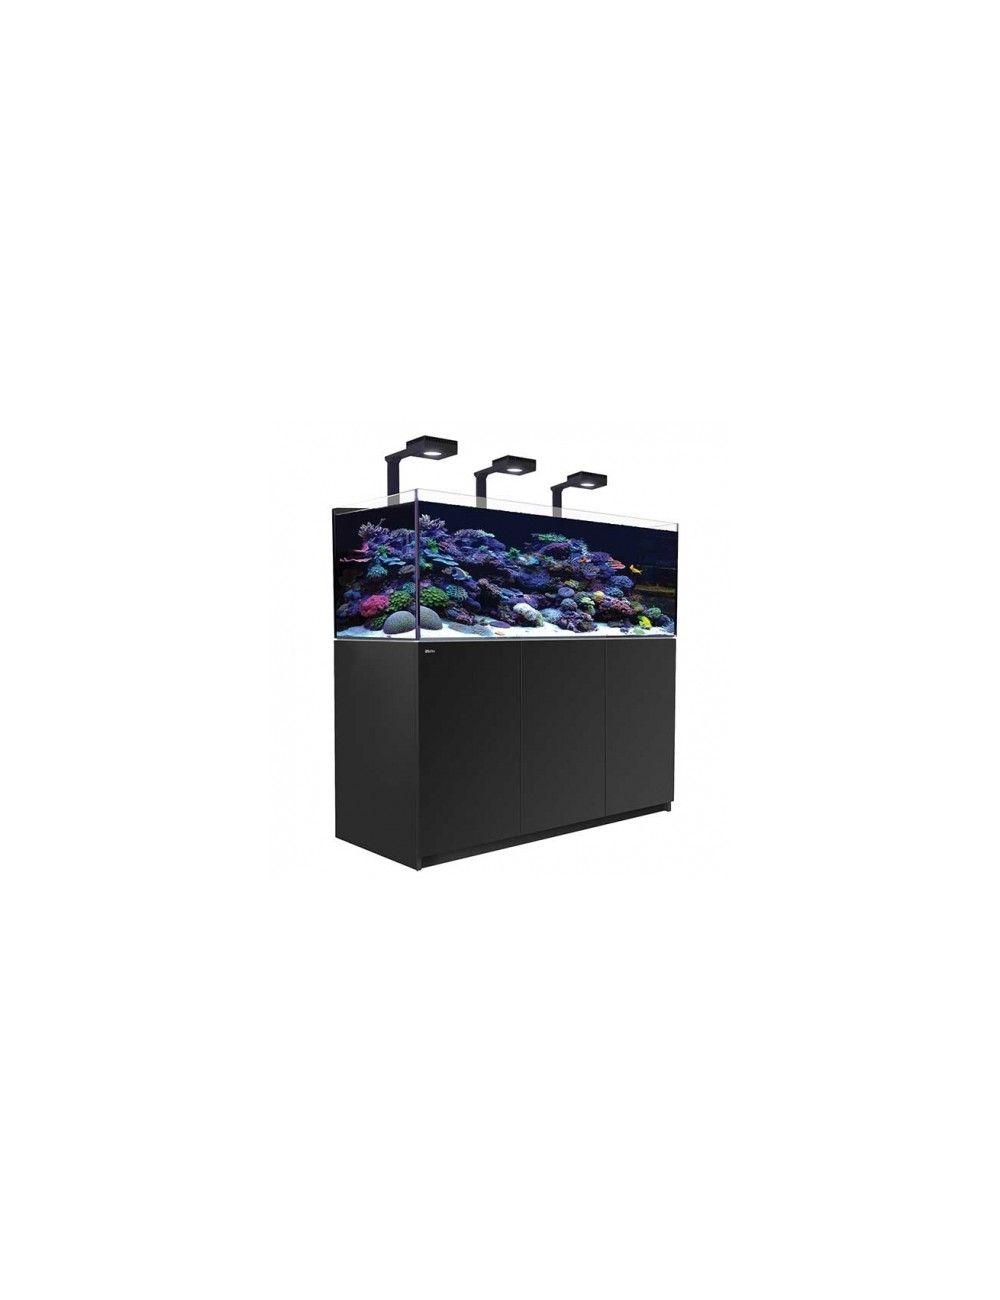 RED SEA - Reefer Deluxe XL 525 - Noir - (3 ReefLED 90 et 3 potences)